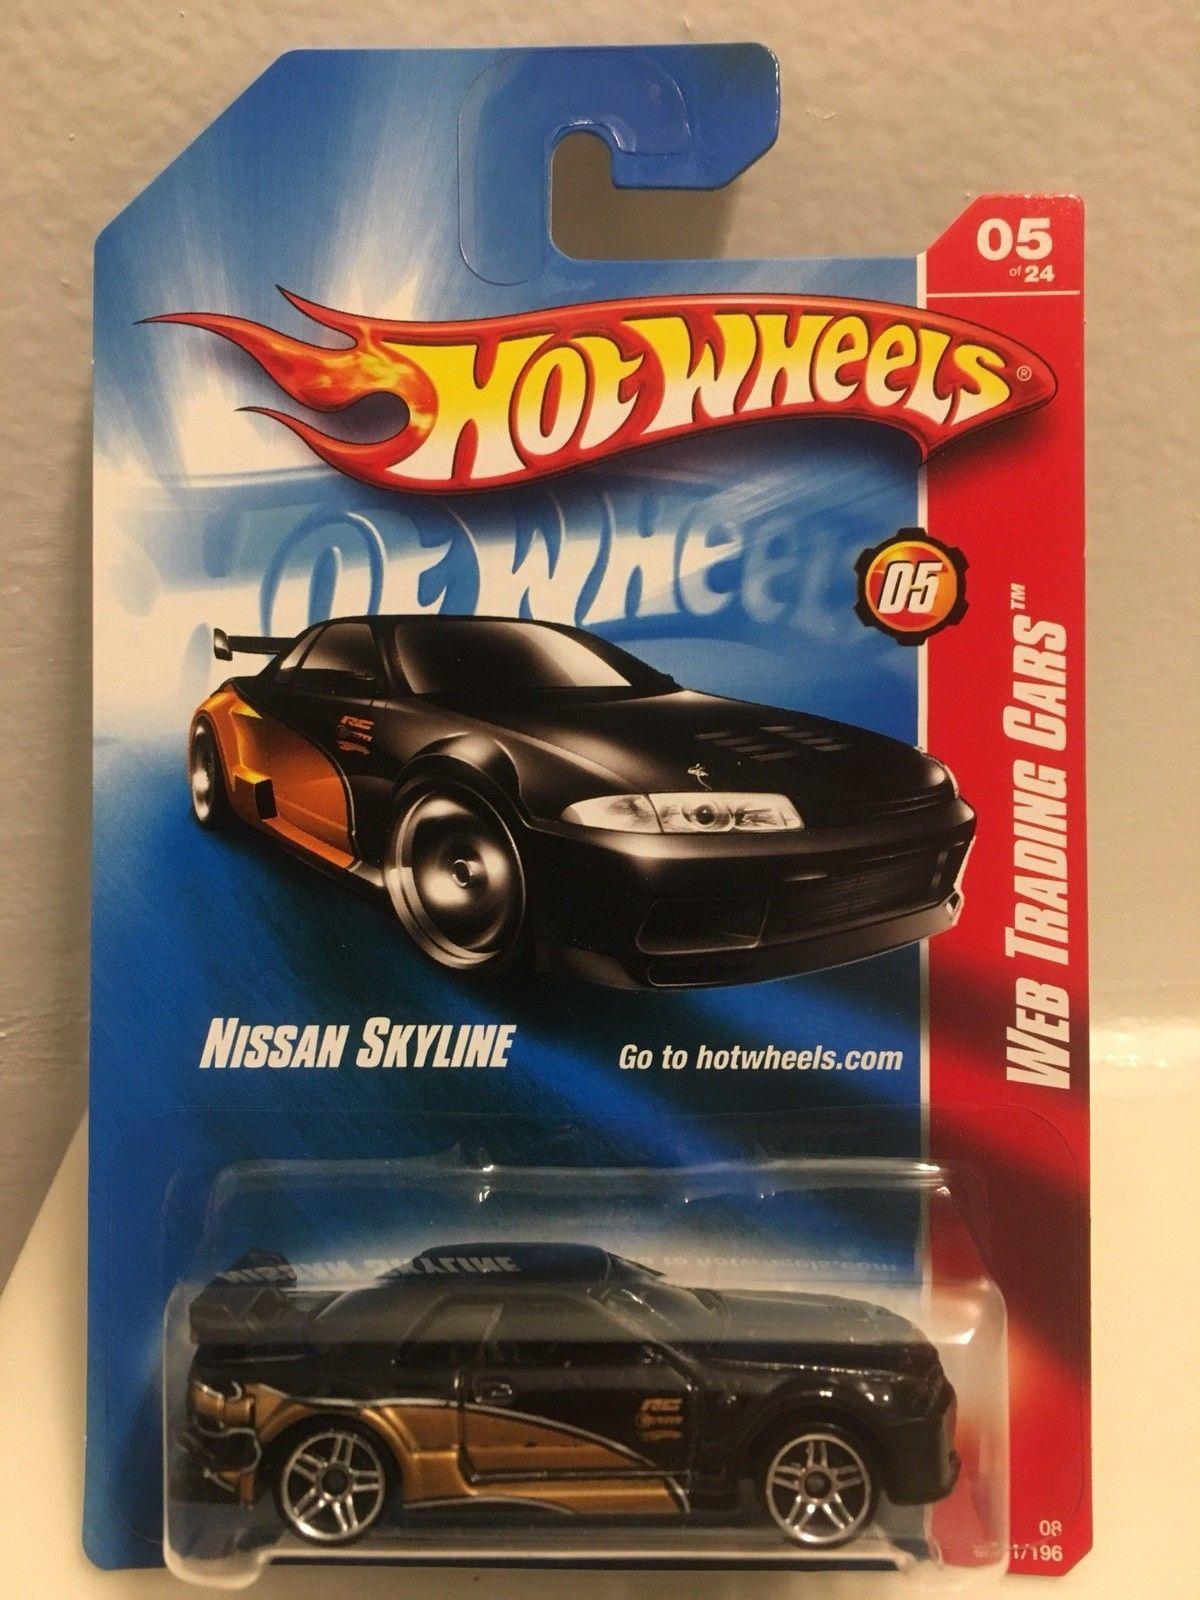 Awesome Nissan 2017 Hot Wheels Skyline Gtr R34 2010 Hotwheels 82 R30 Silver Nice Web Trading Cars In Black 2018